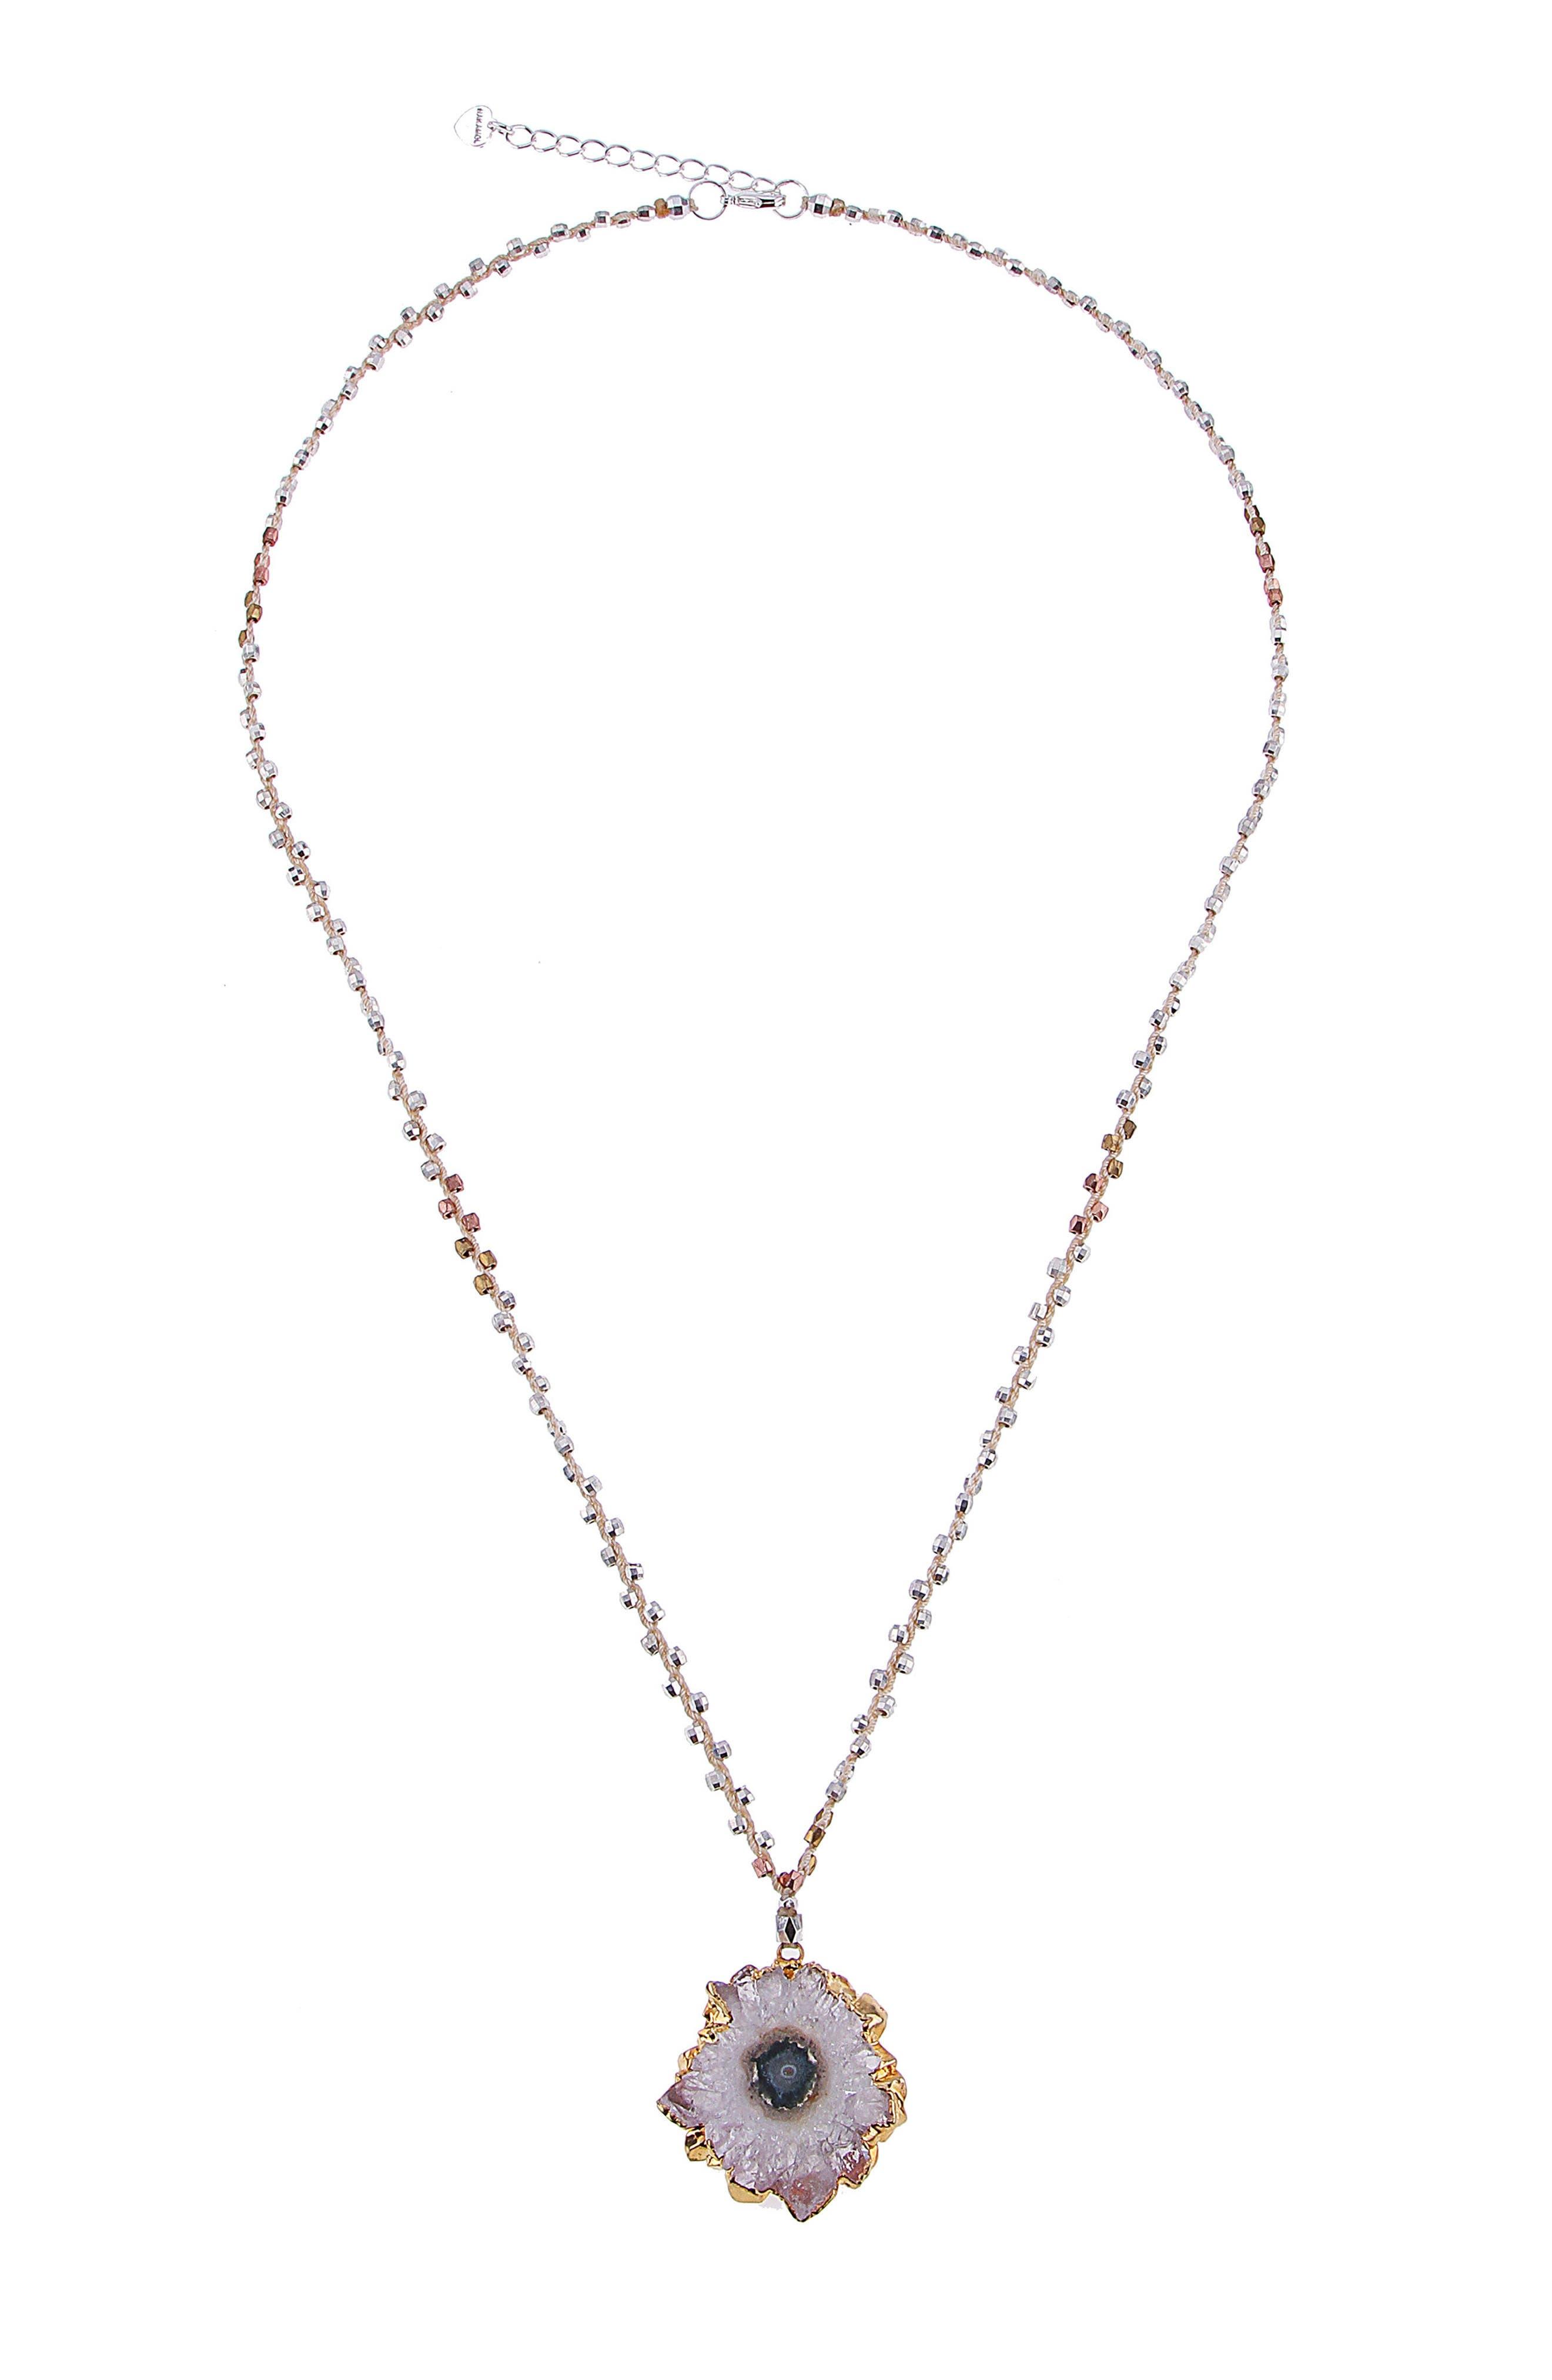 Main Image - Nakamol Design Cote Amethyst Pendant Necklace